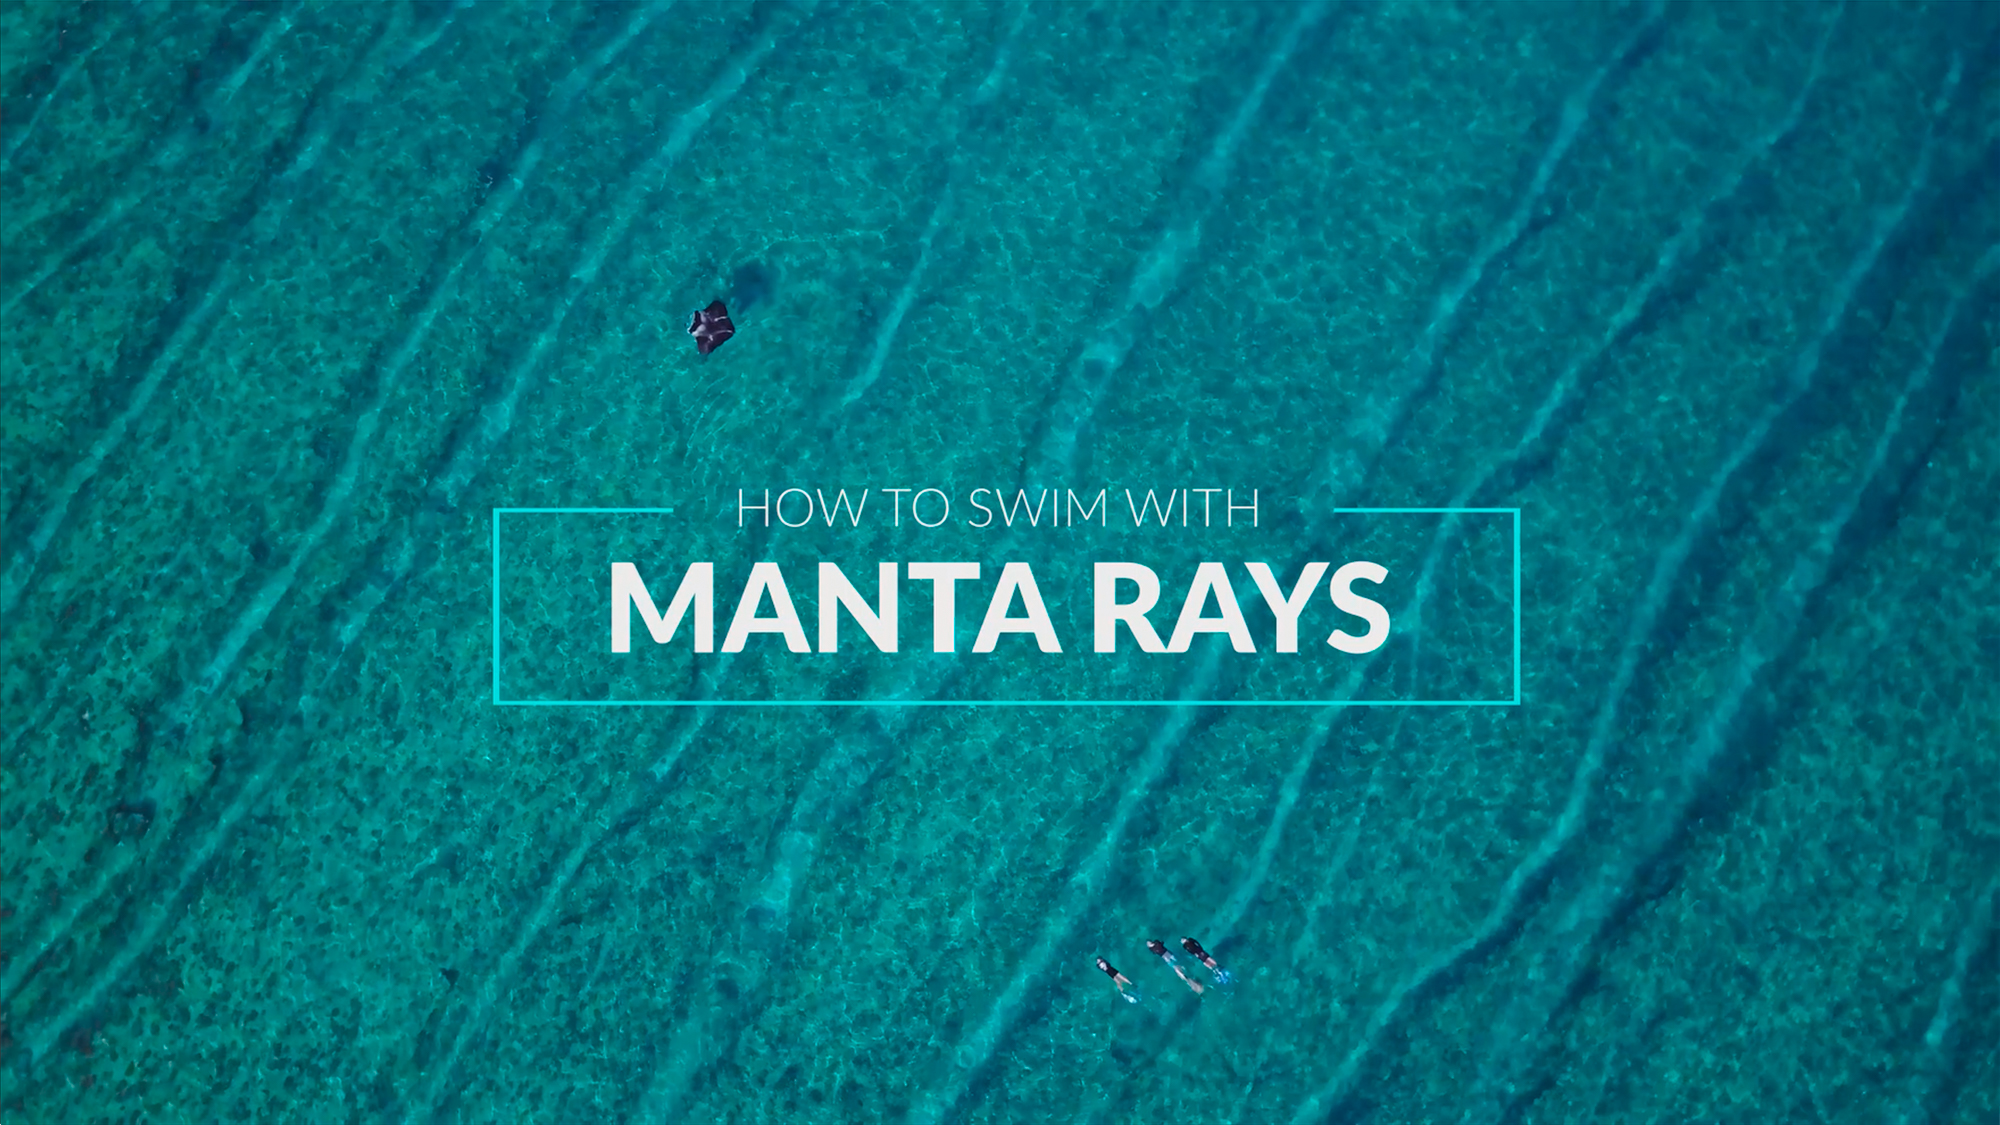 How to Swim with Mantas_English Version_Website Thumbnail.jpg